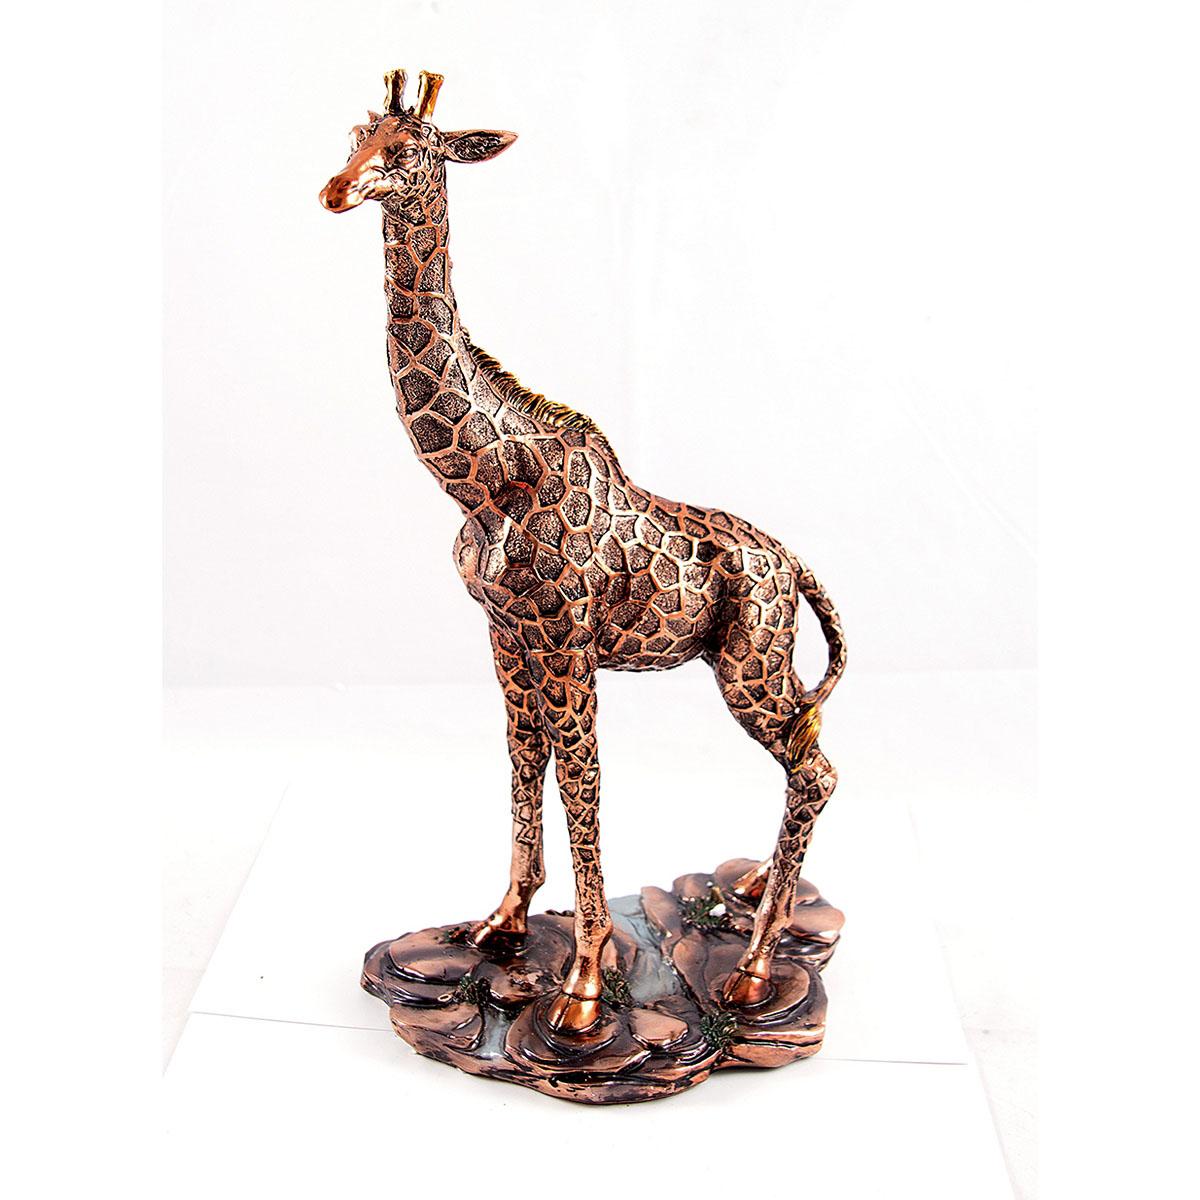 Статуэтка Русские Подарки Жираф, 21 х 37 см статуэтка русские подарки мисс утонченность 12 х 10 х 34 см